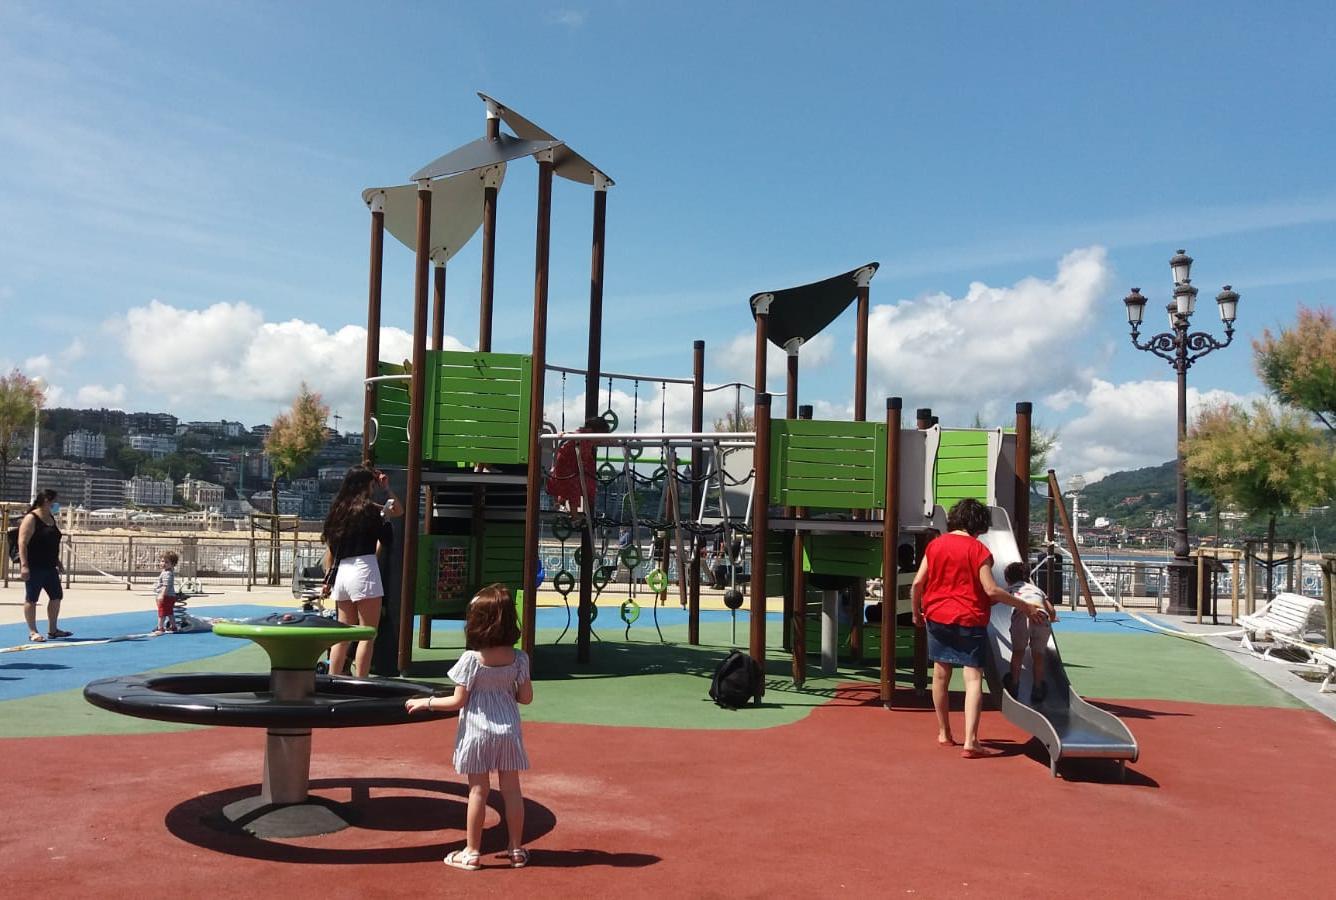 Parque infantil de Alderdi Eder. Foto: Ayuntamiento